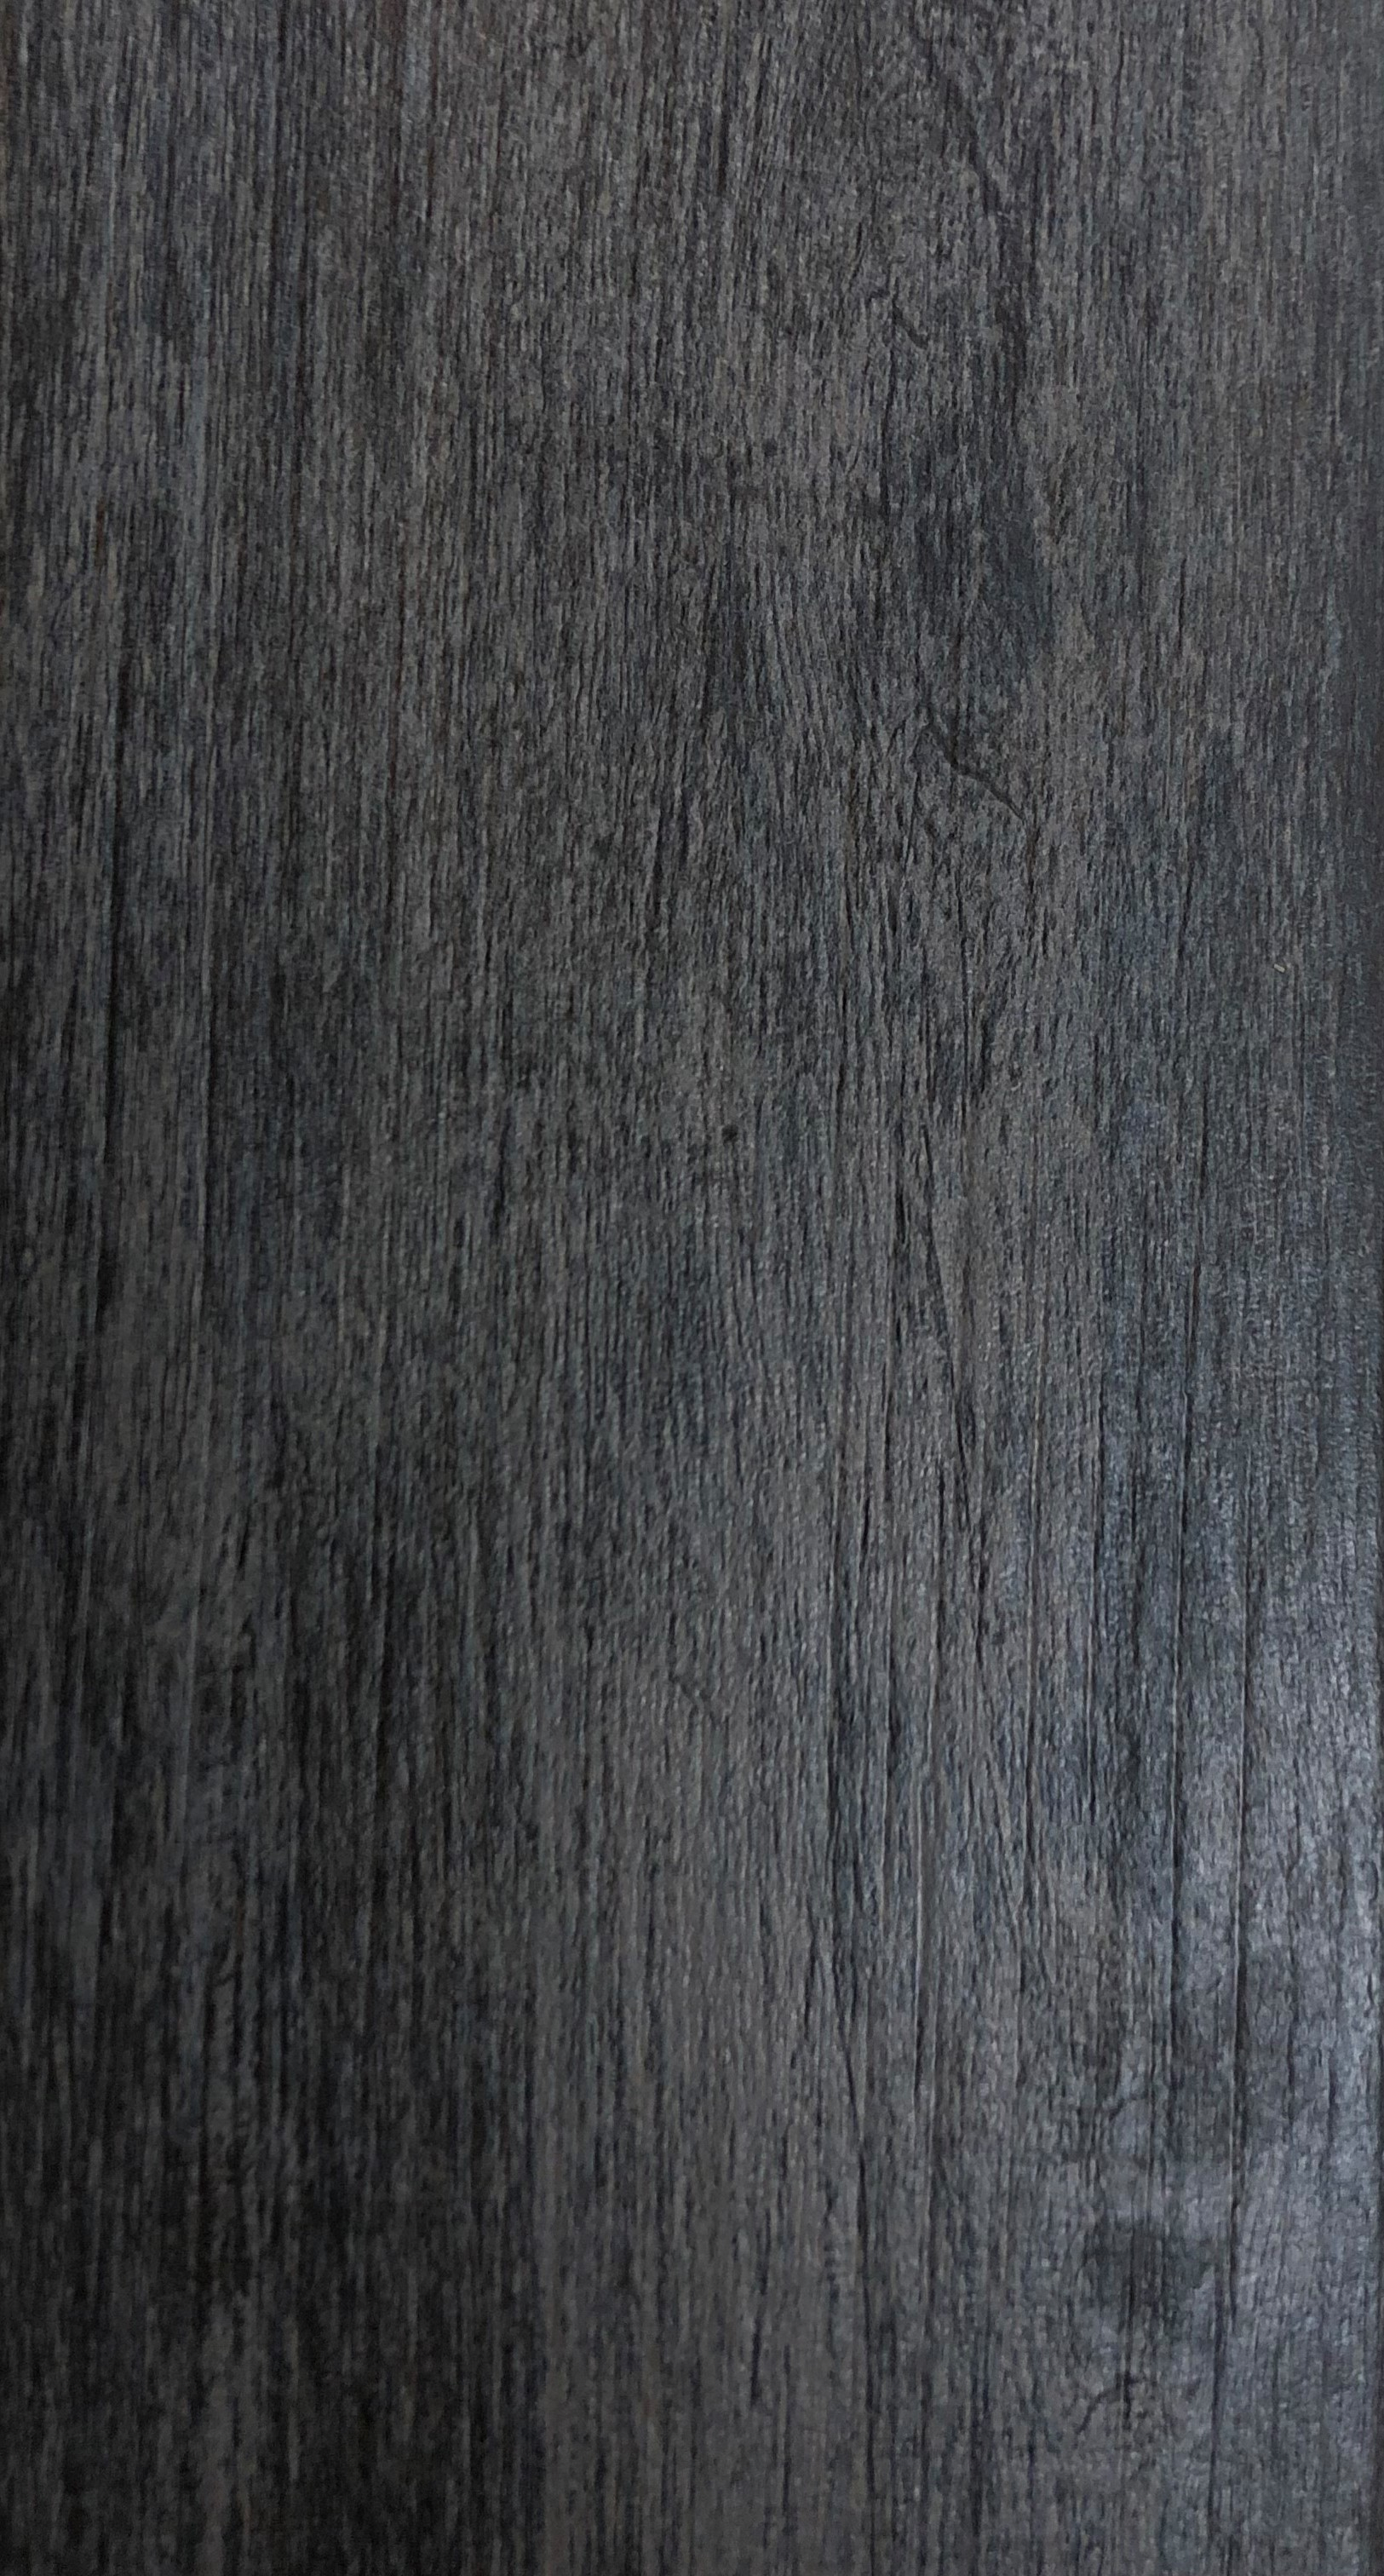 Sunwood Pro, Centennial Grey | 7